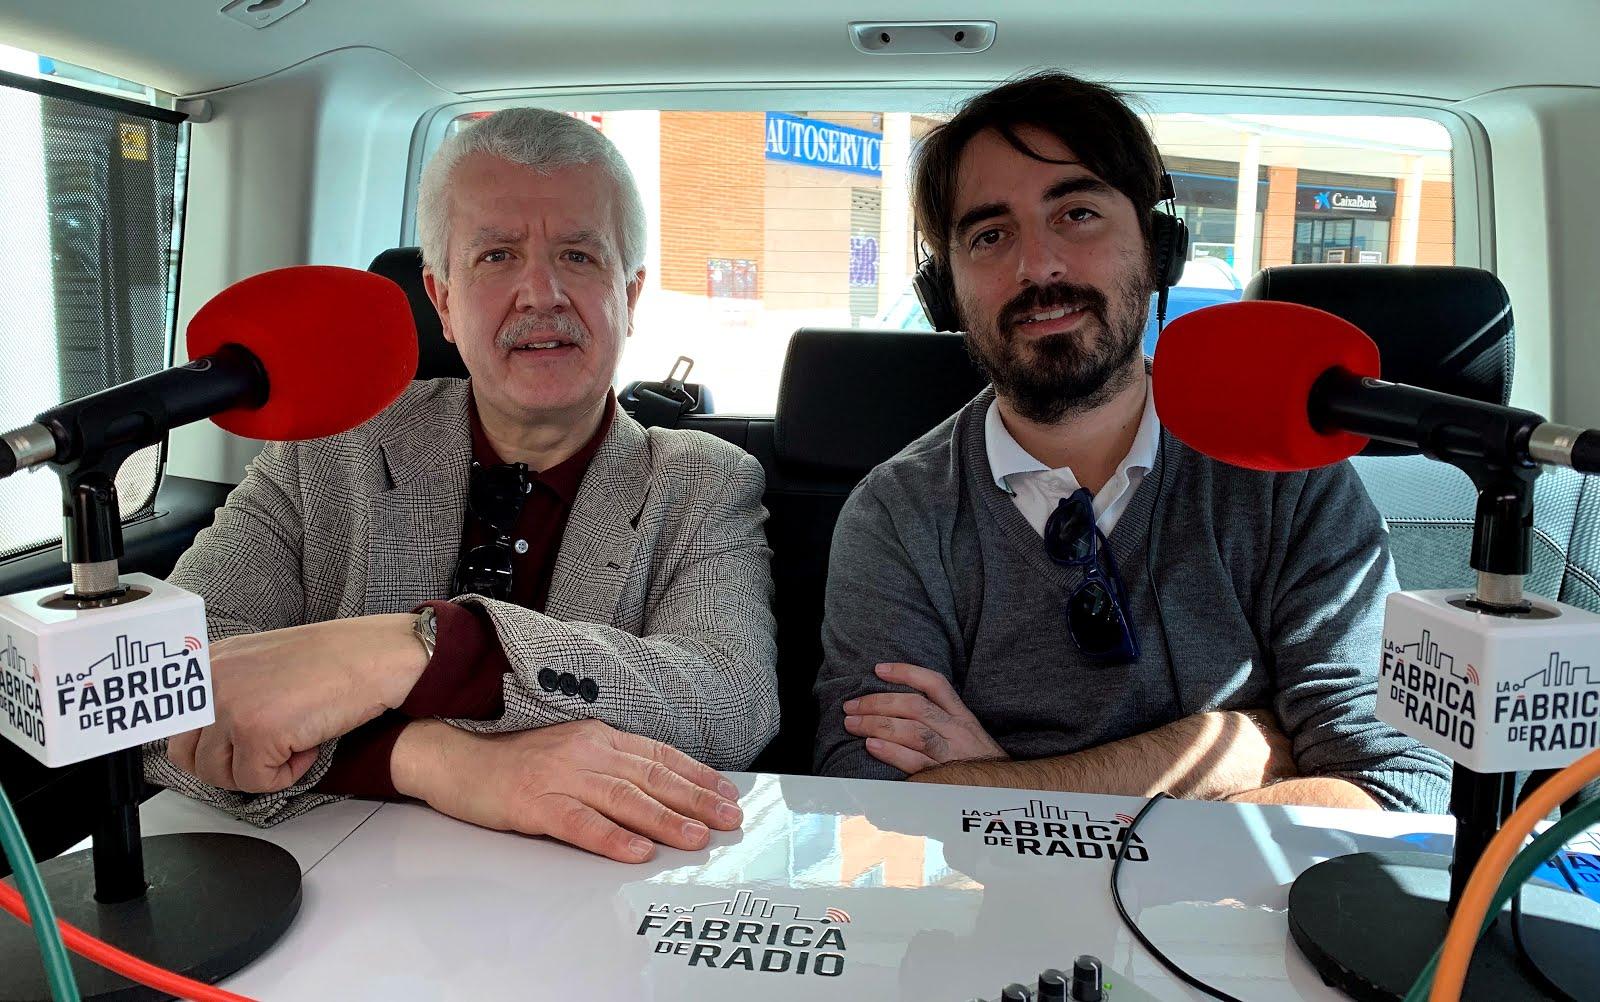 AVANCE: 'LA FÁBRICA DE RADIO' EN MADRID